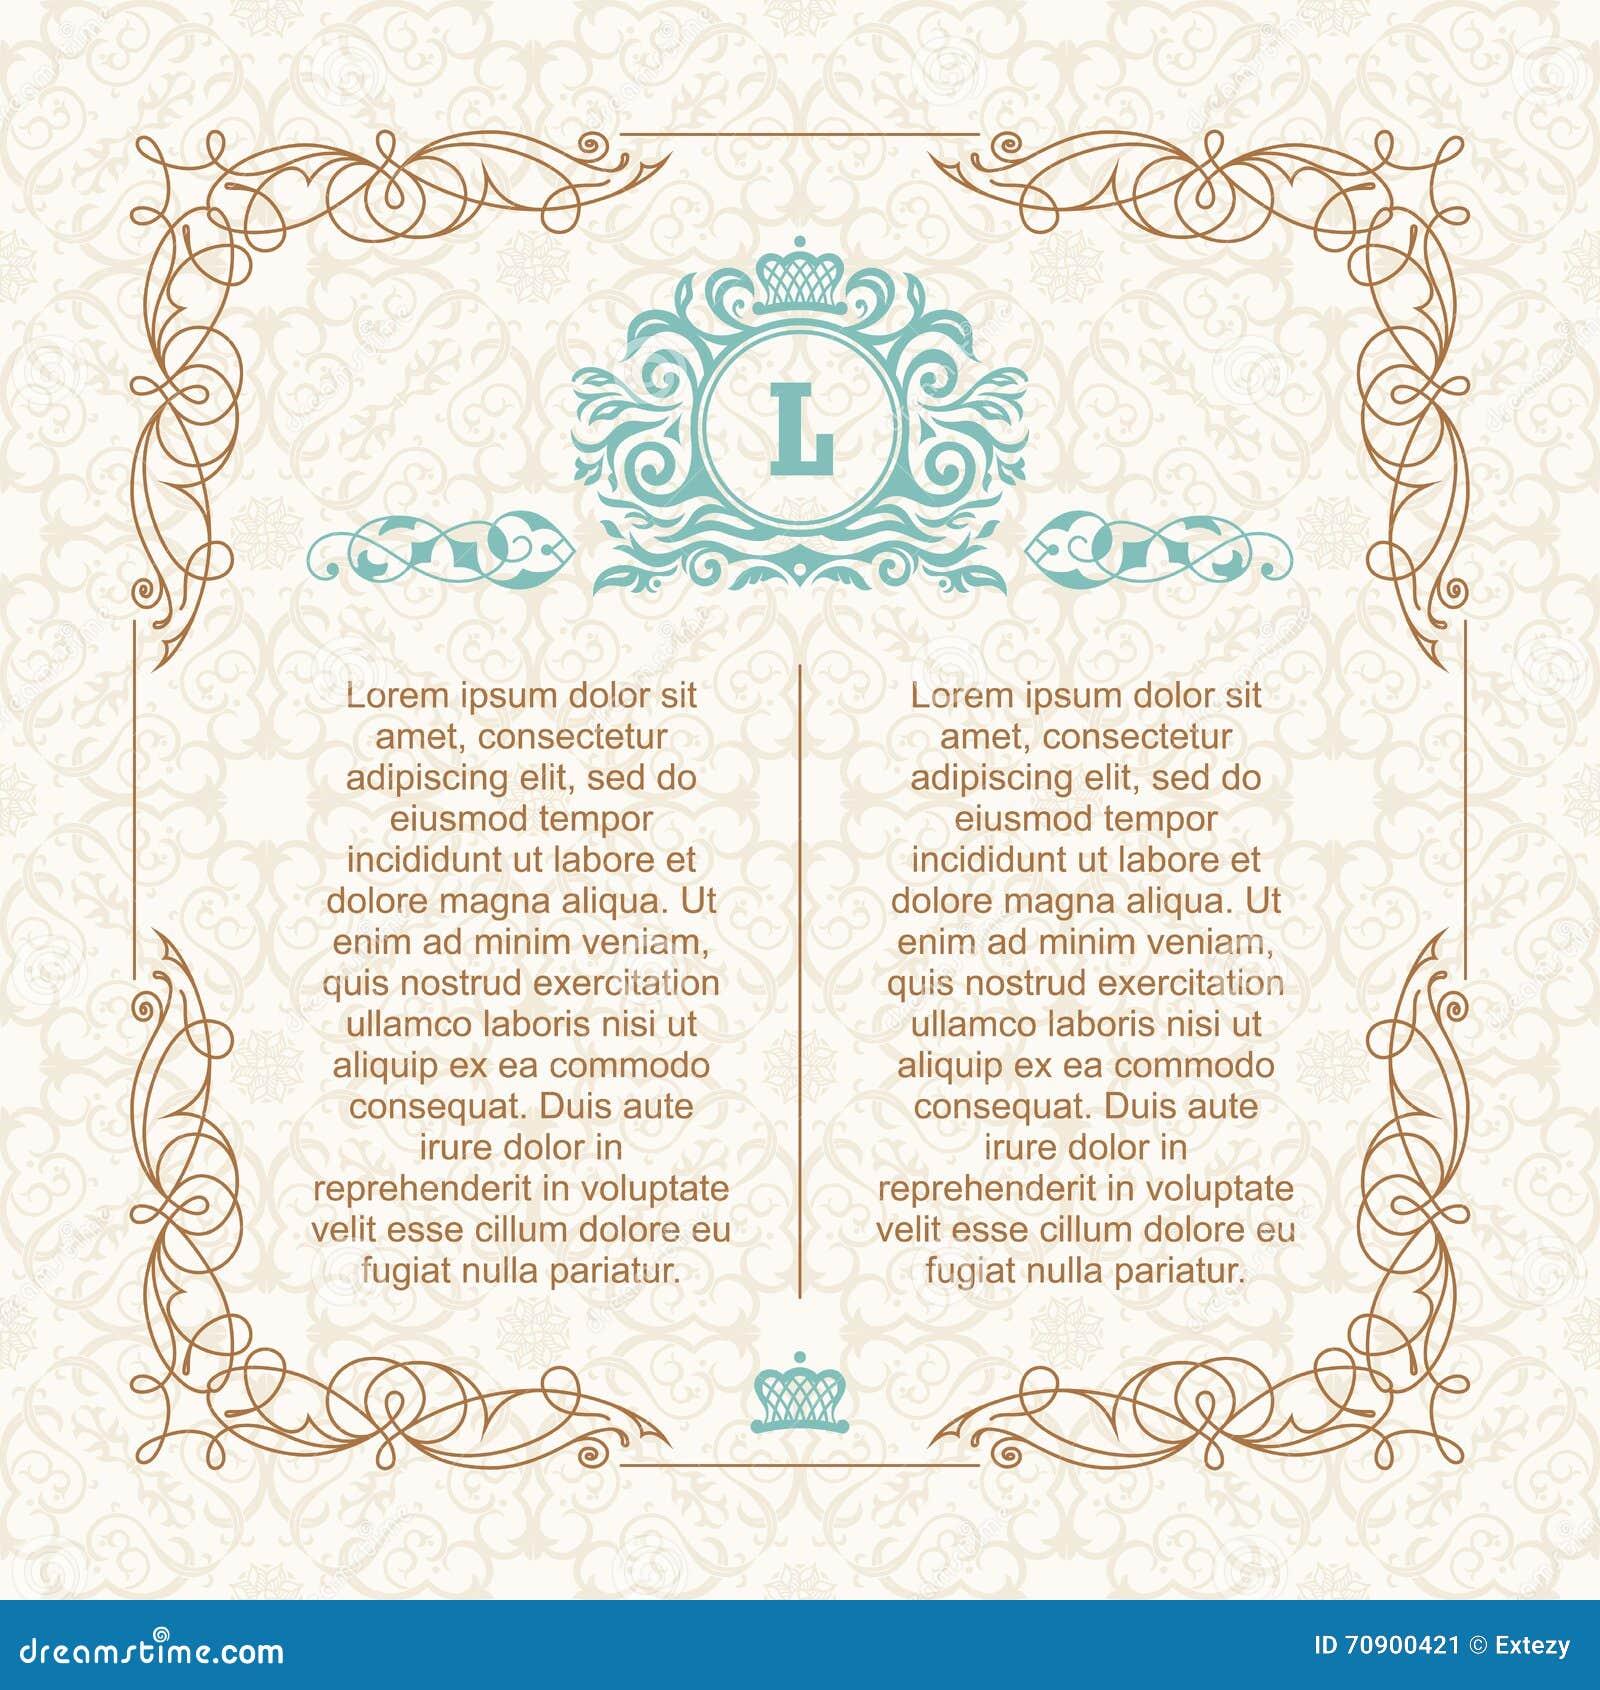 Design Template For Wedding Greeting Card Invitation Menu